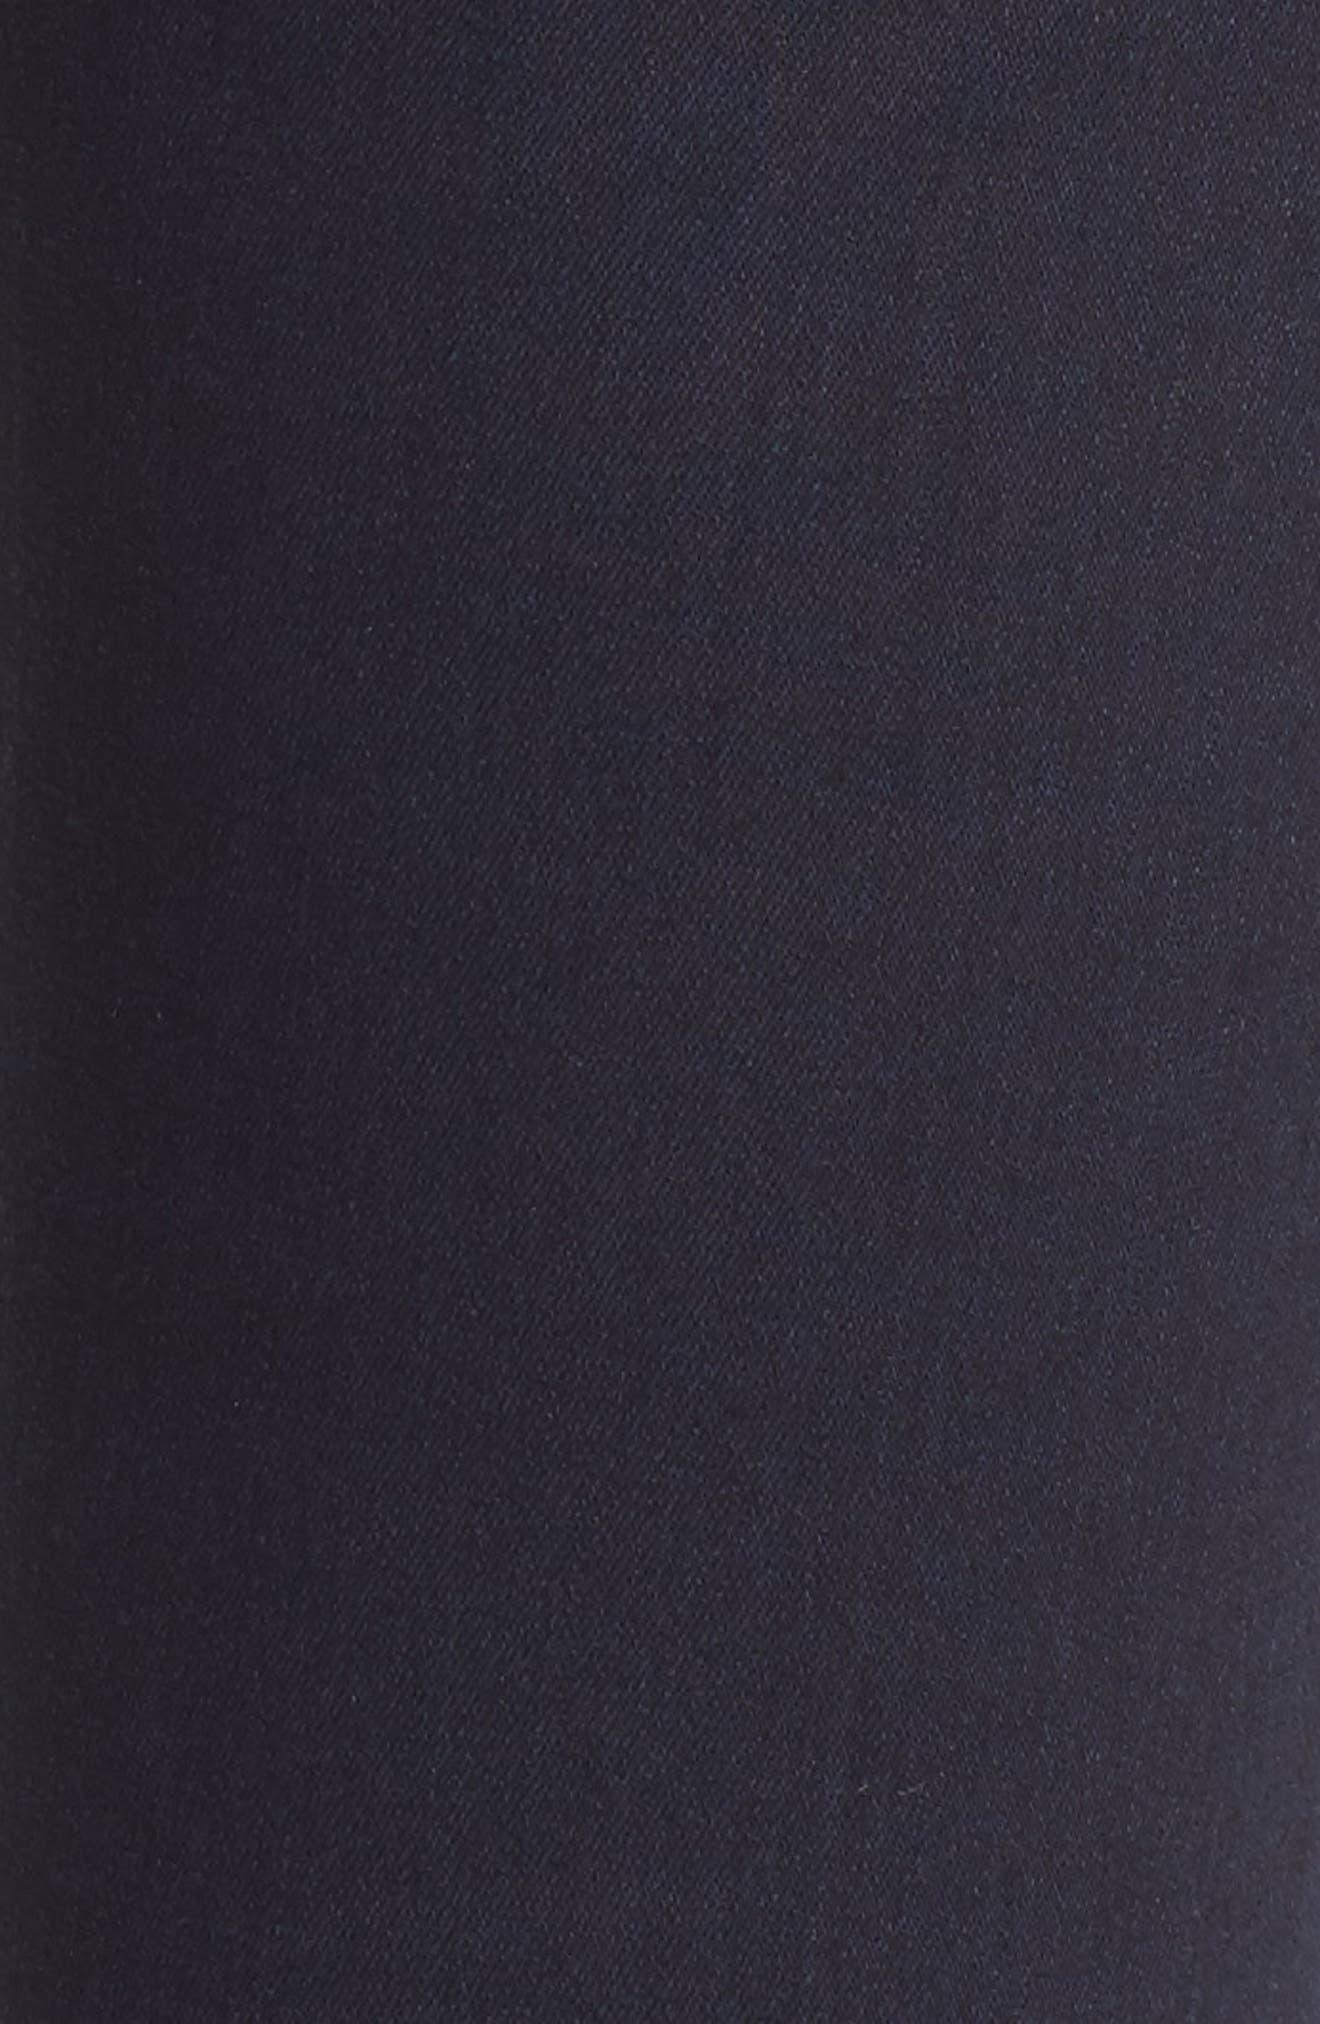 Rocket High Waist Skinny Jeans,                             Alternate thumbnail 6, color,                             Ozone Ink